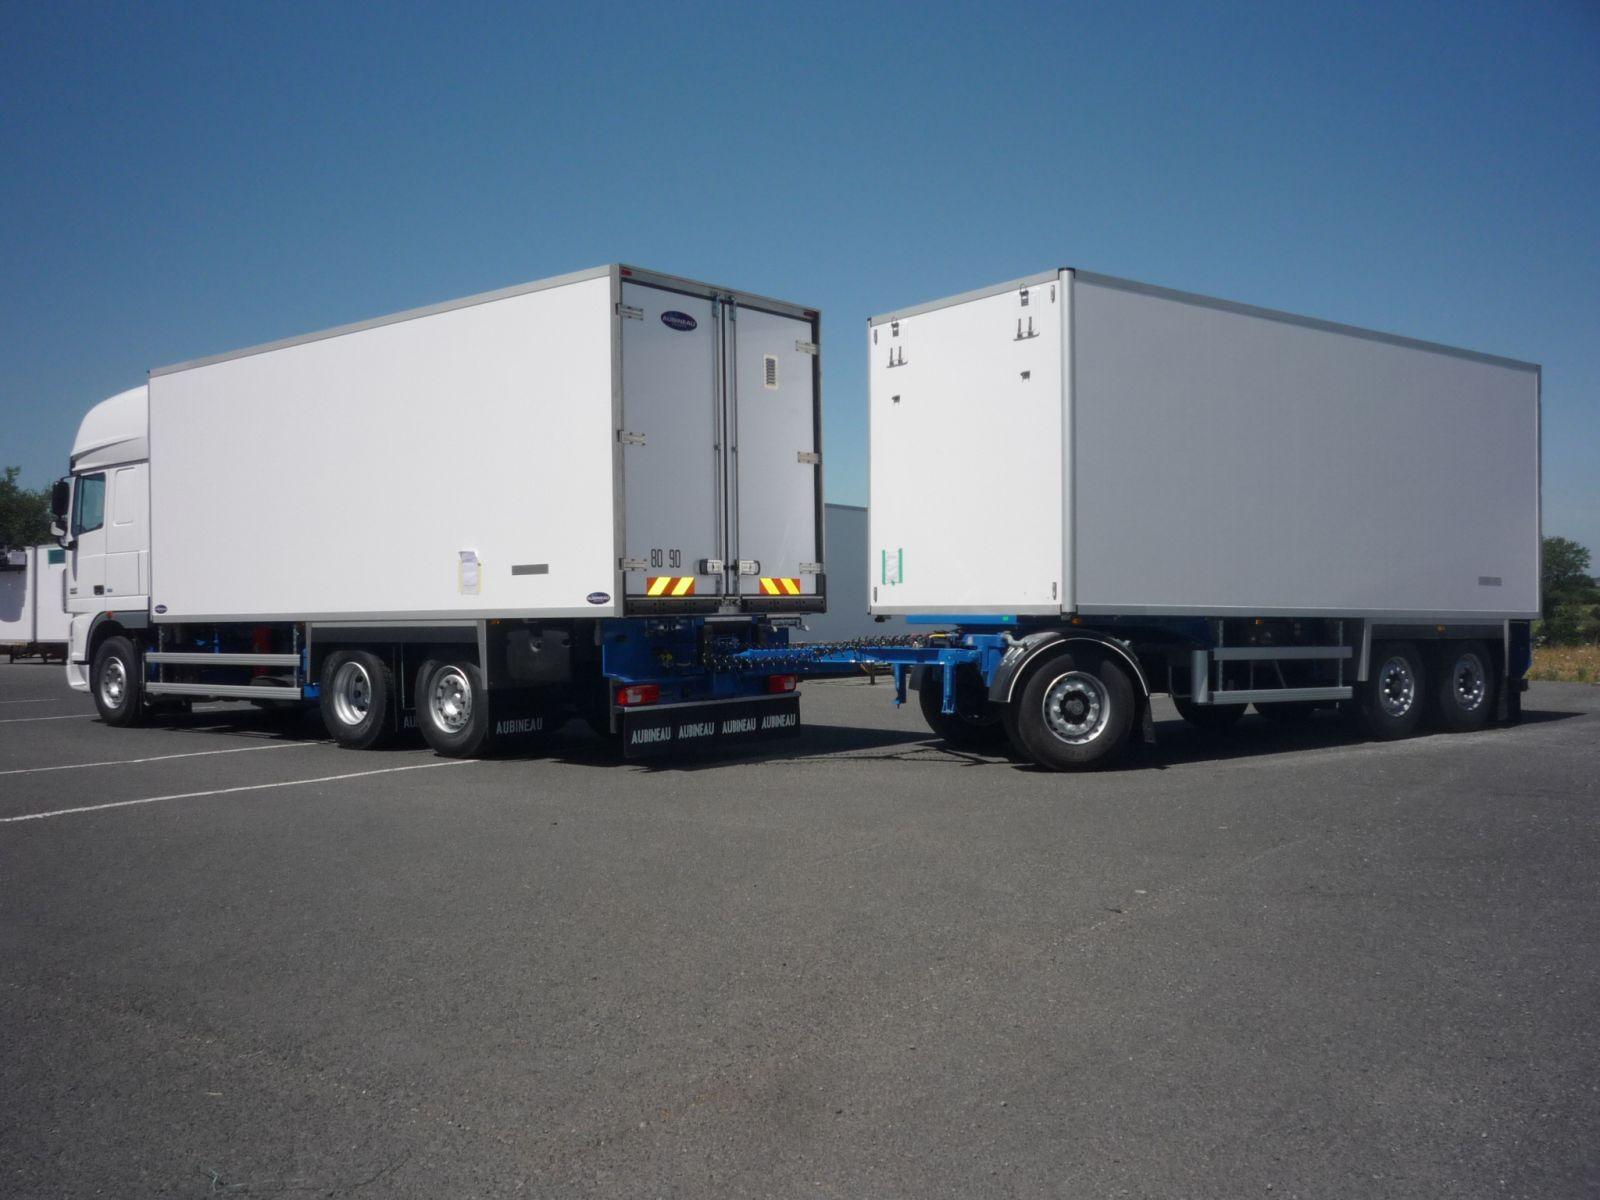 camions remorques aubineau constructeur. Black Bedroom Furniture Sets. Home Design Ideas